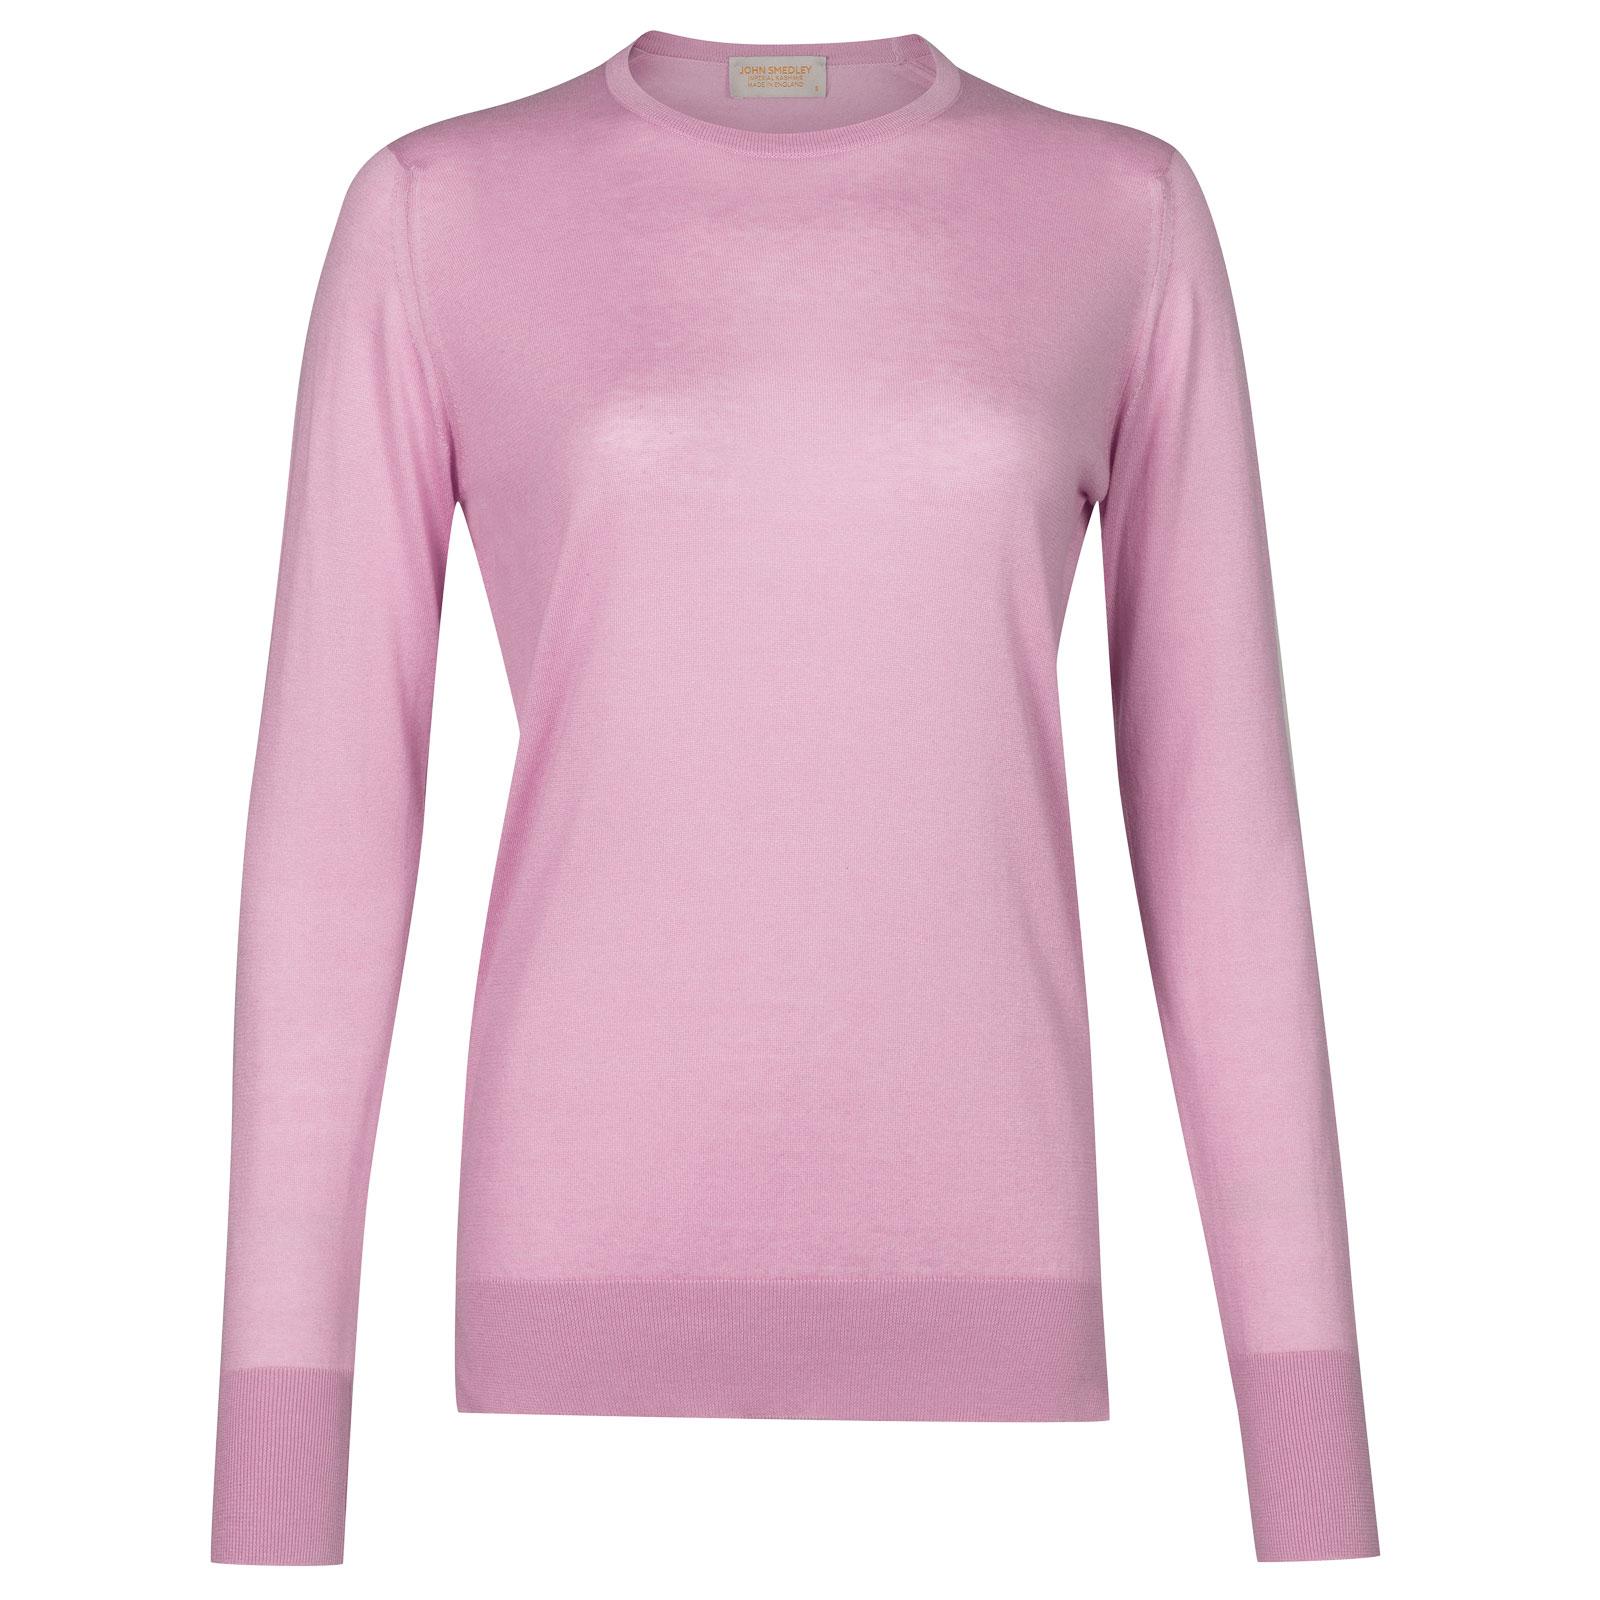 patsy-keeling-pink-L